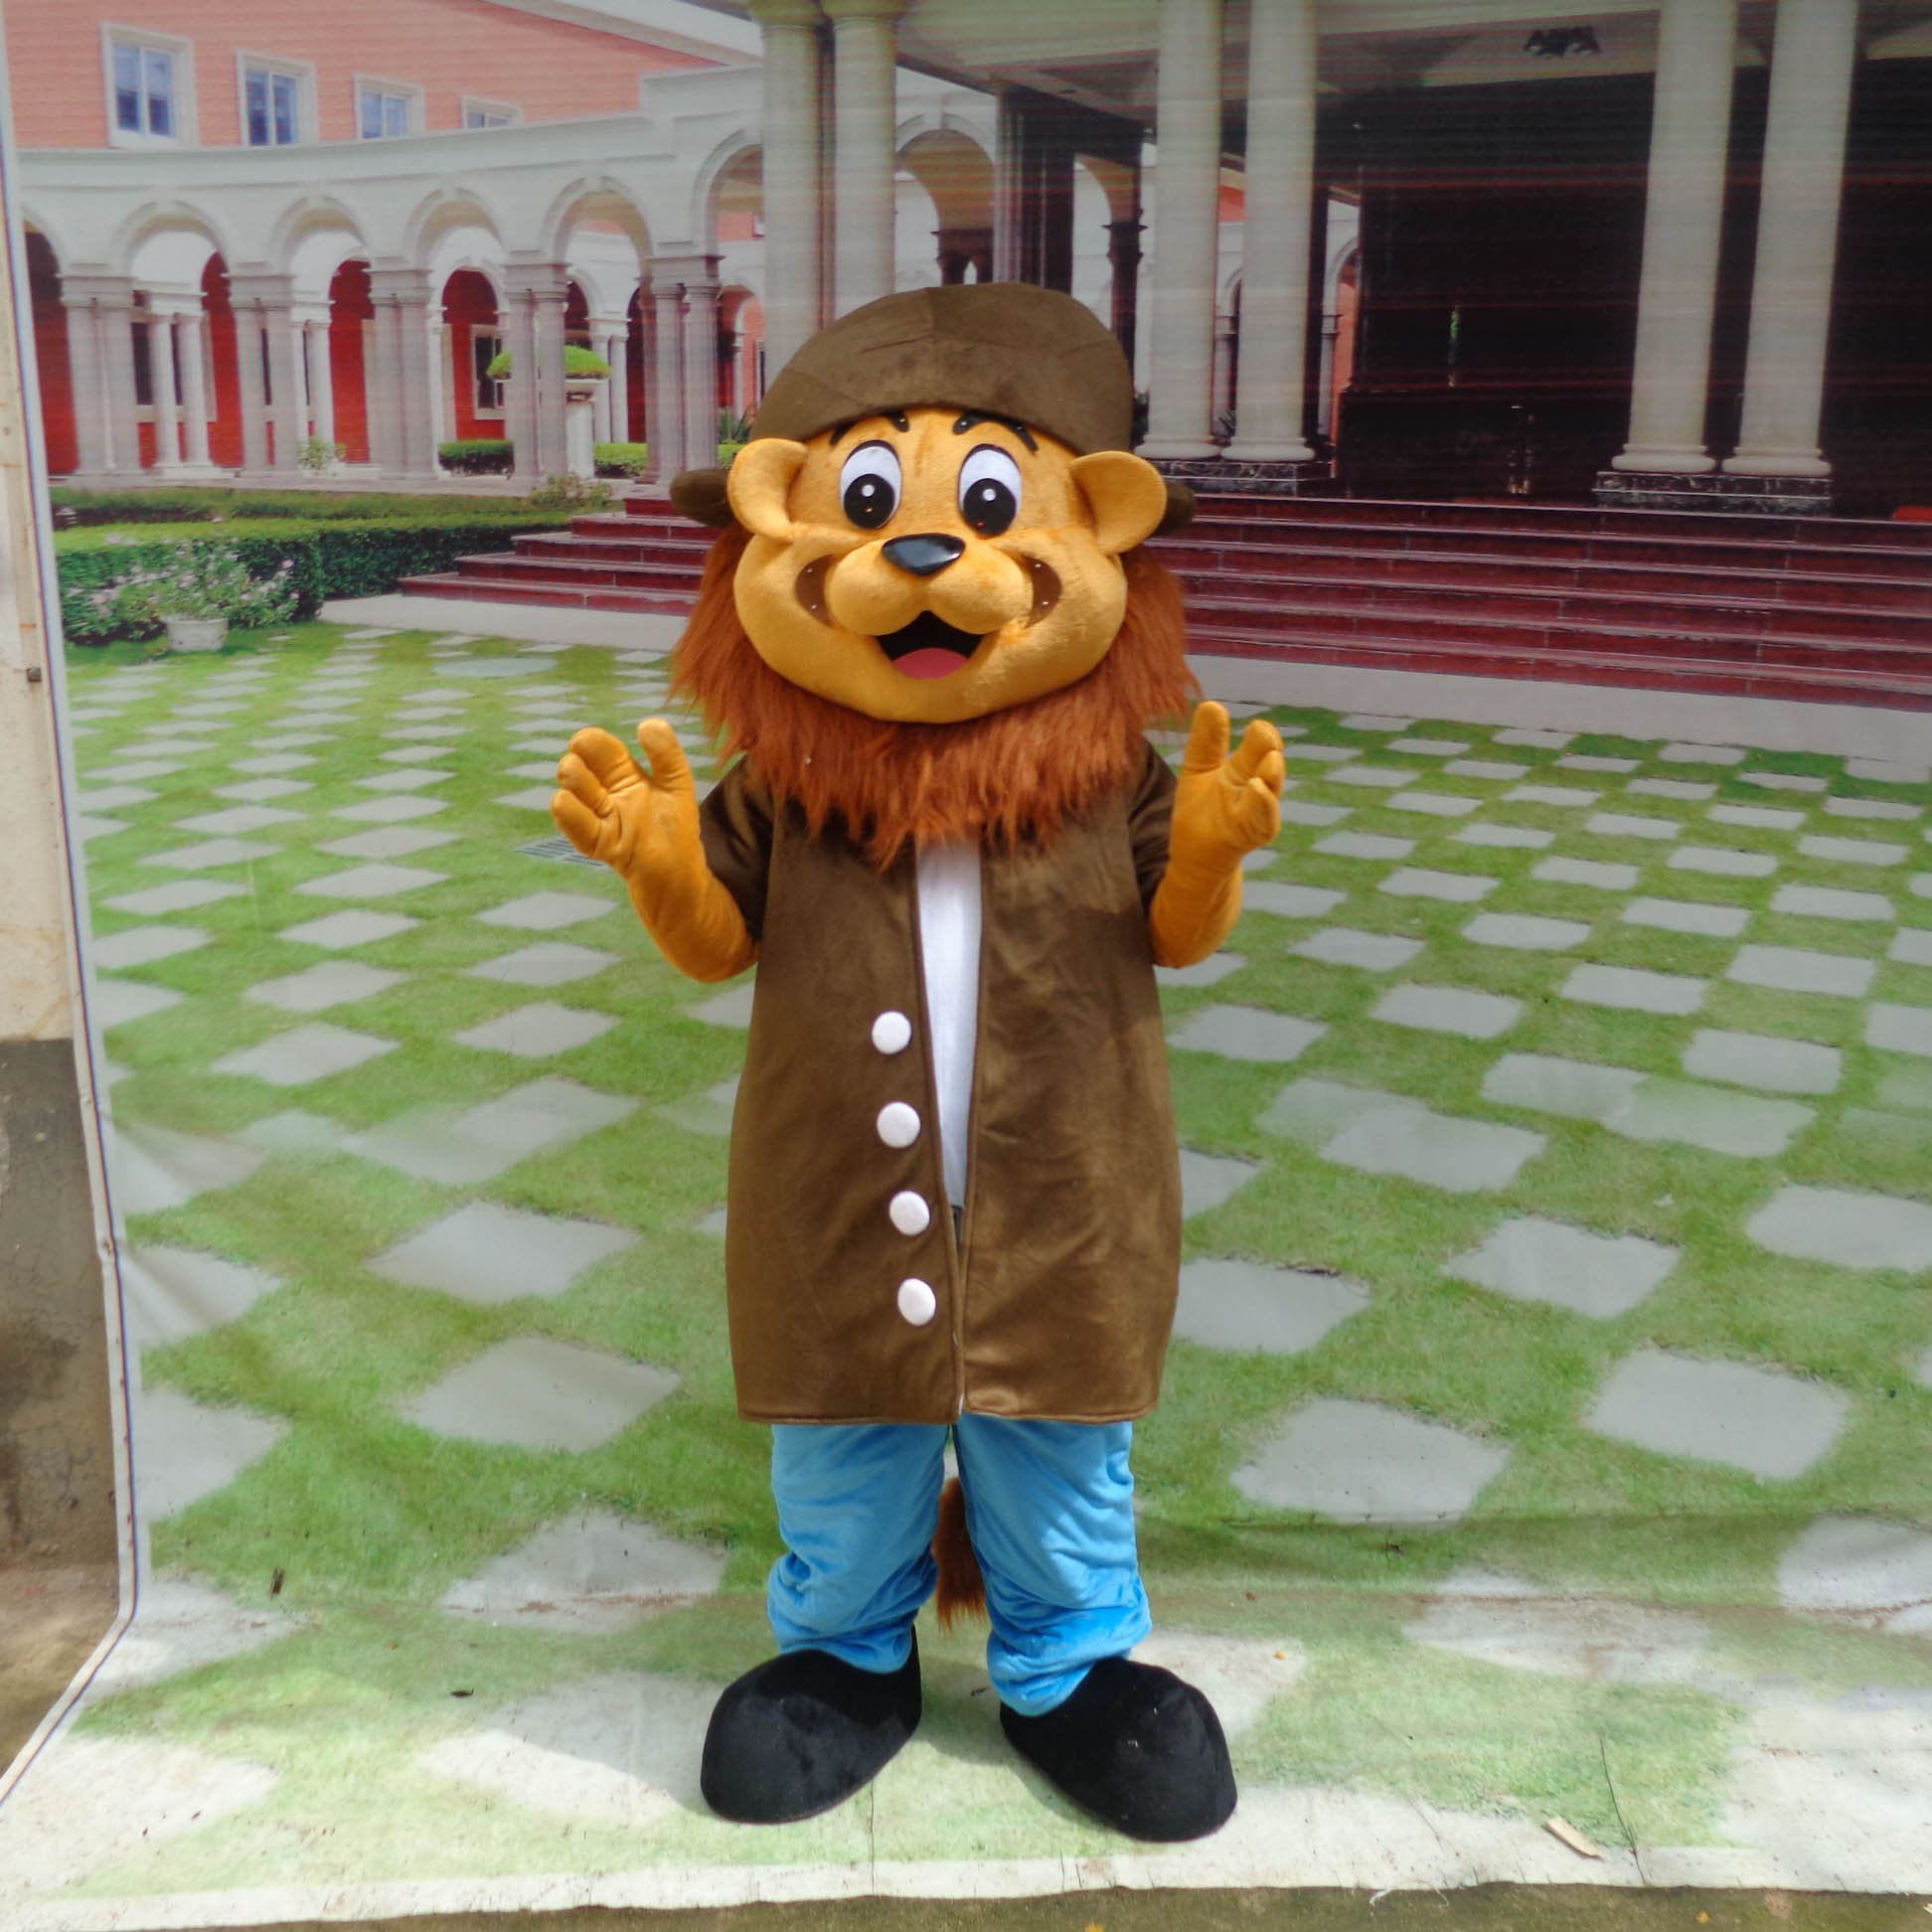 Lion Cartoon Doll Clothing Cartoon Walking Doll Clothing Doll Clothing Doll Clothing Cartoon Show Props Mascot Costume